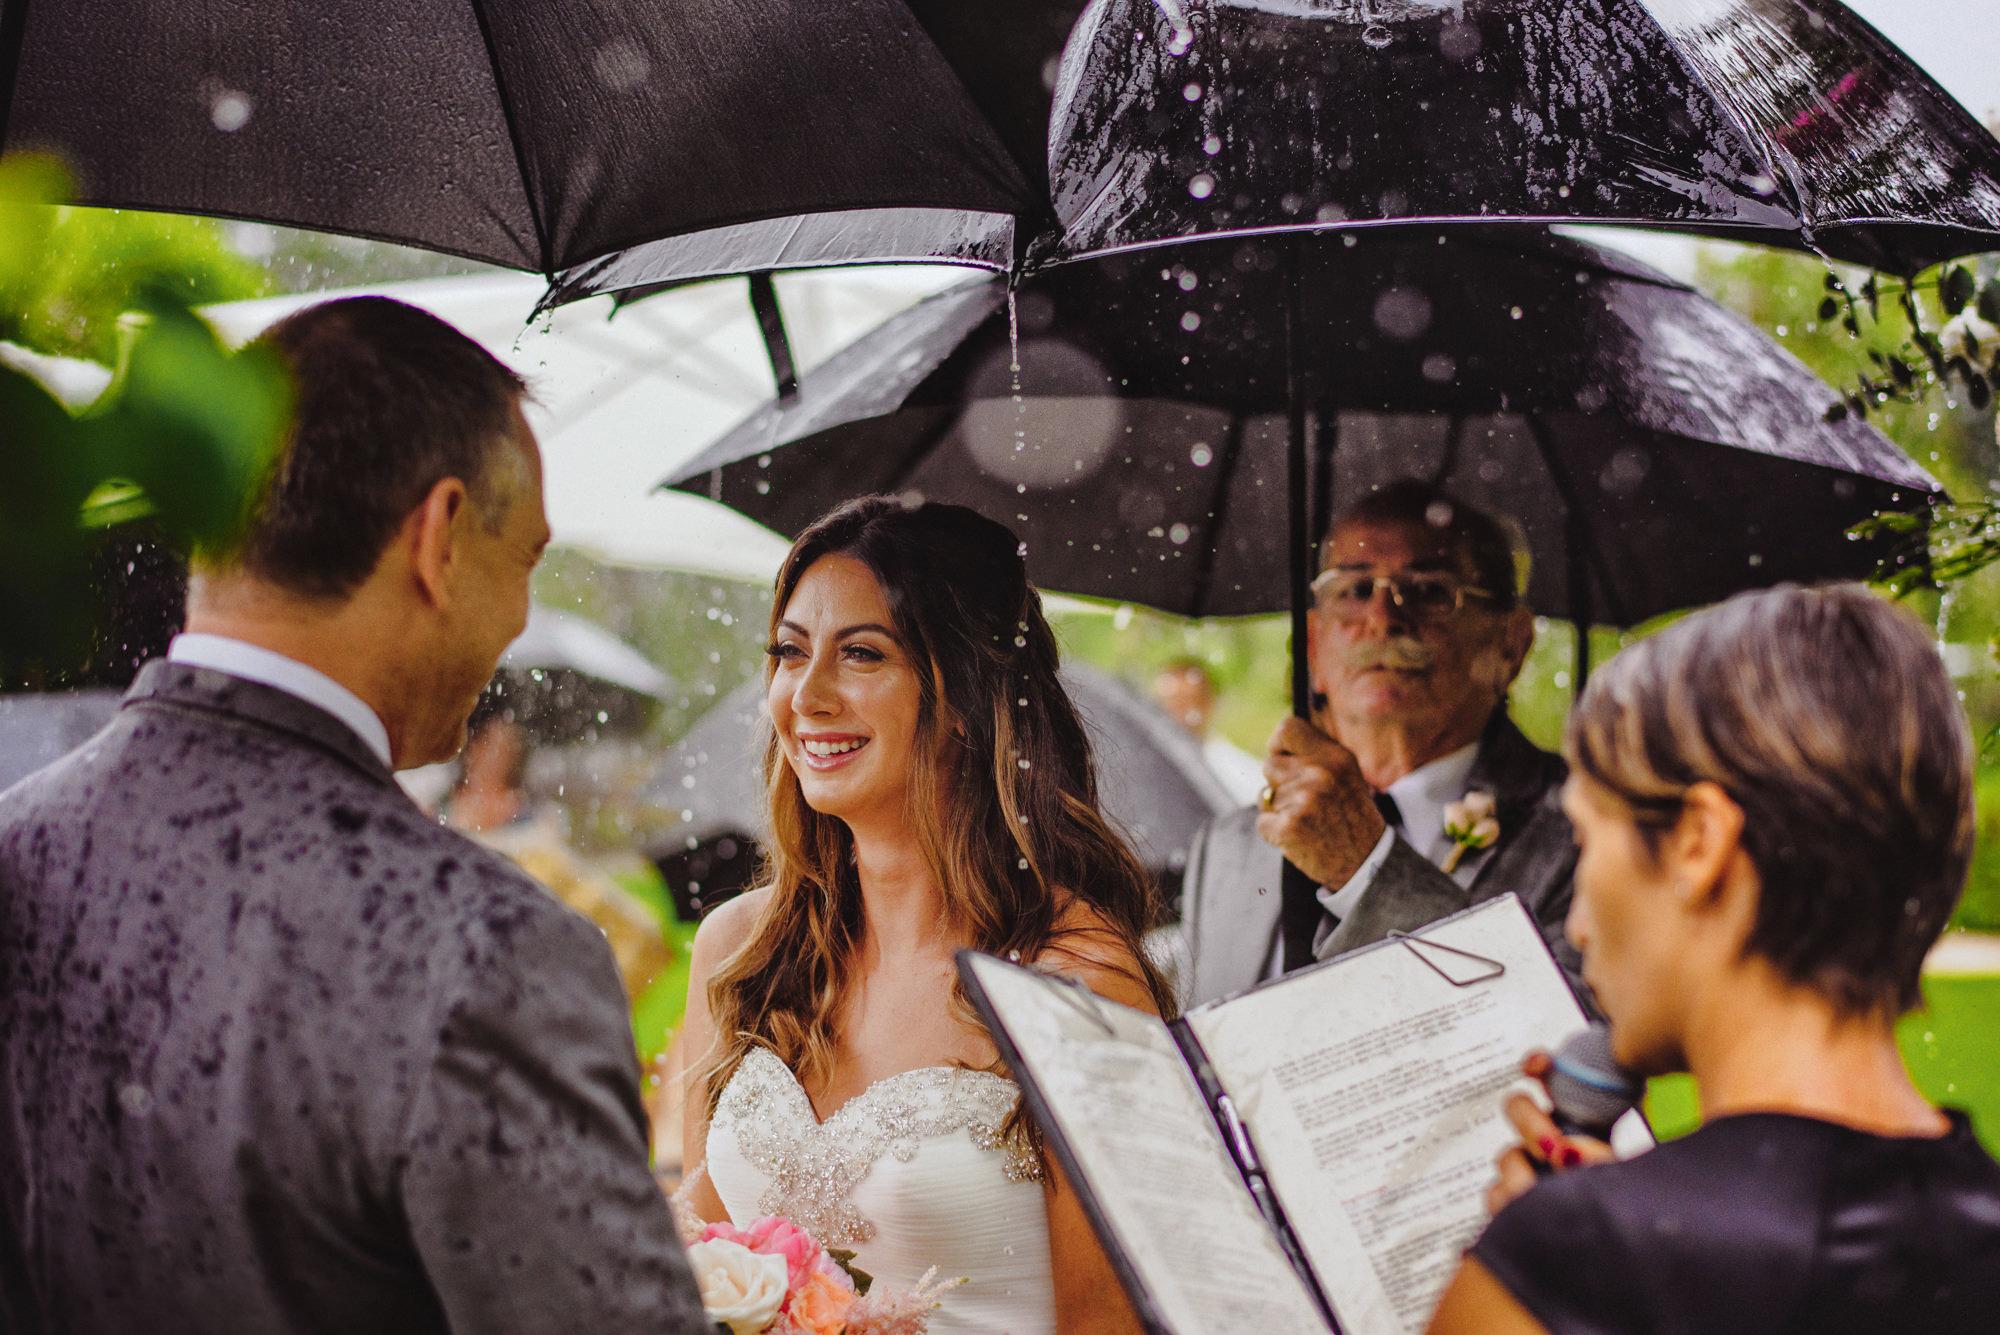 Rainy day wedding ceremony - photo by Fer Juaristi